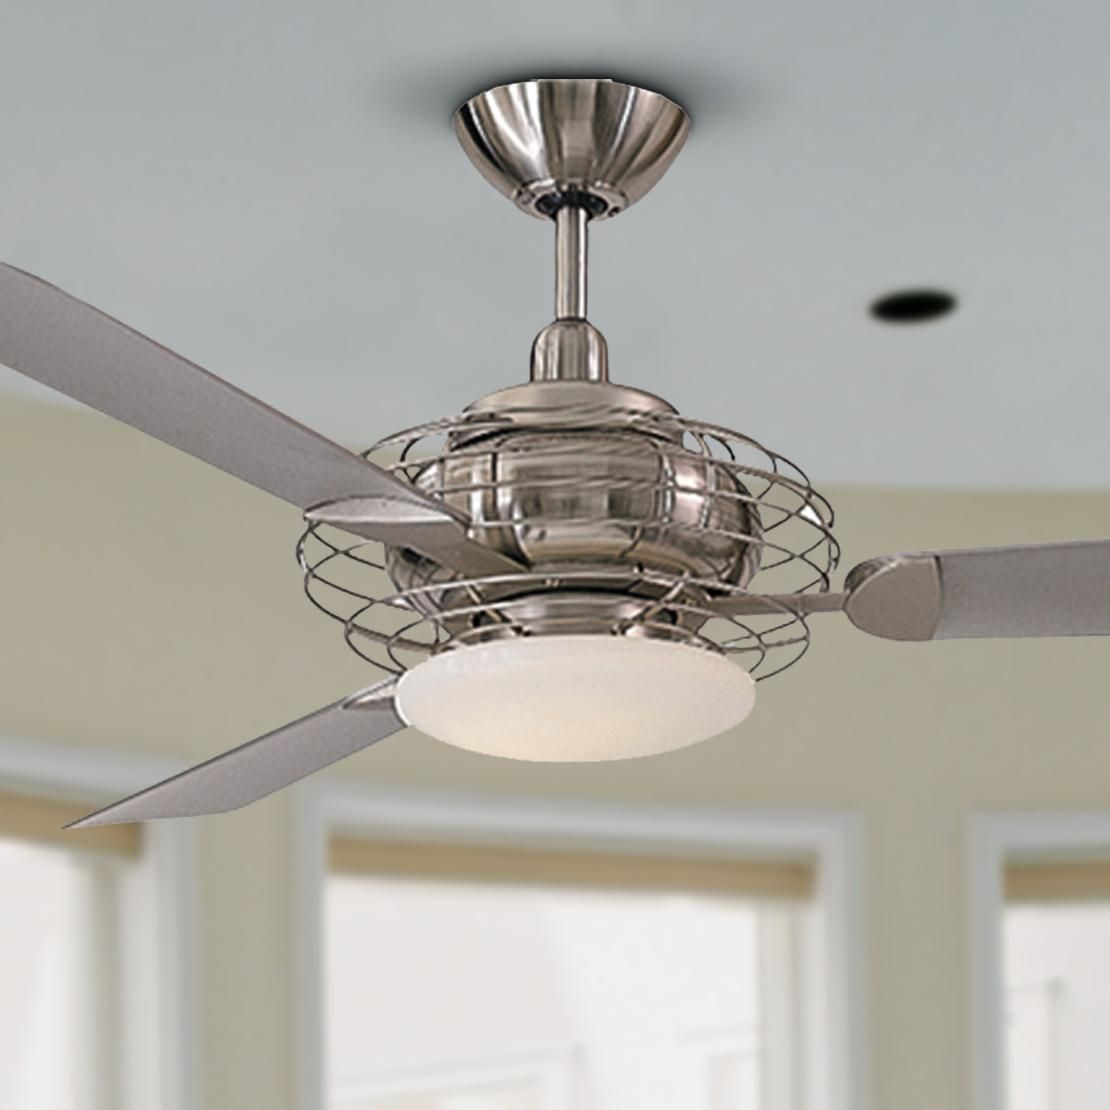 Pin By Lynnette Coster Scolari On Benton Kitchen Ceiling Fan